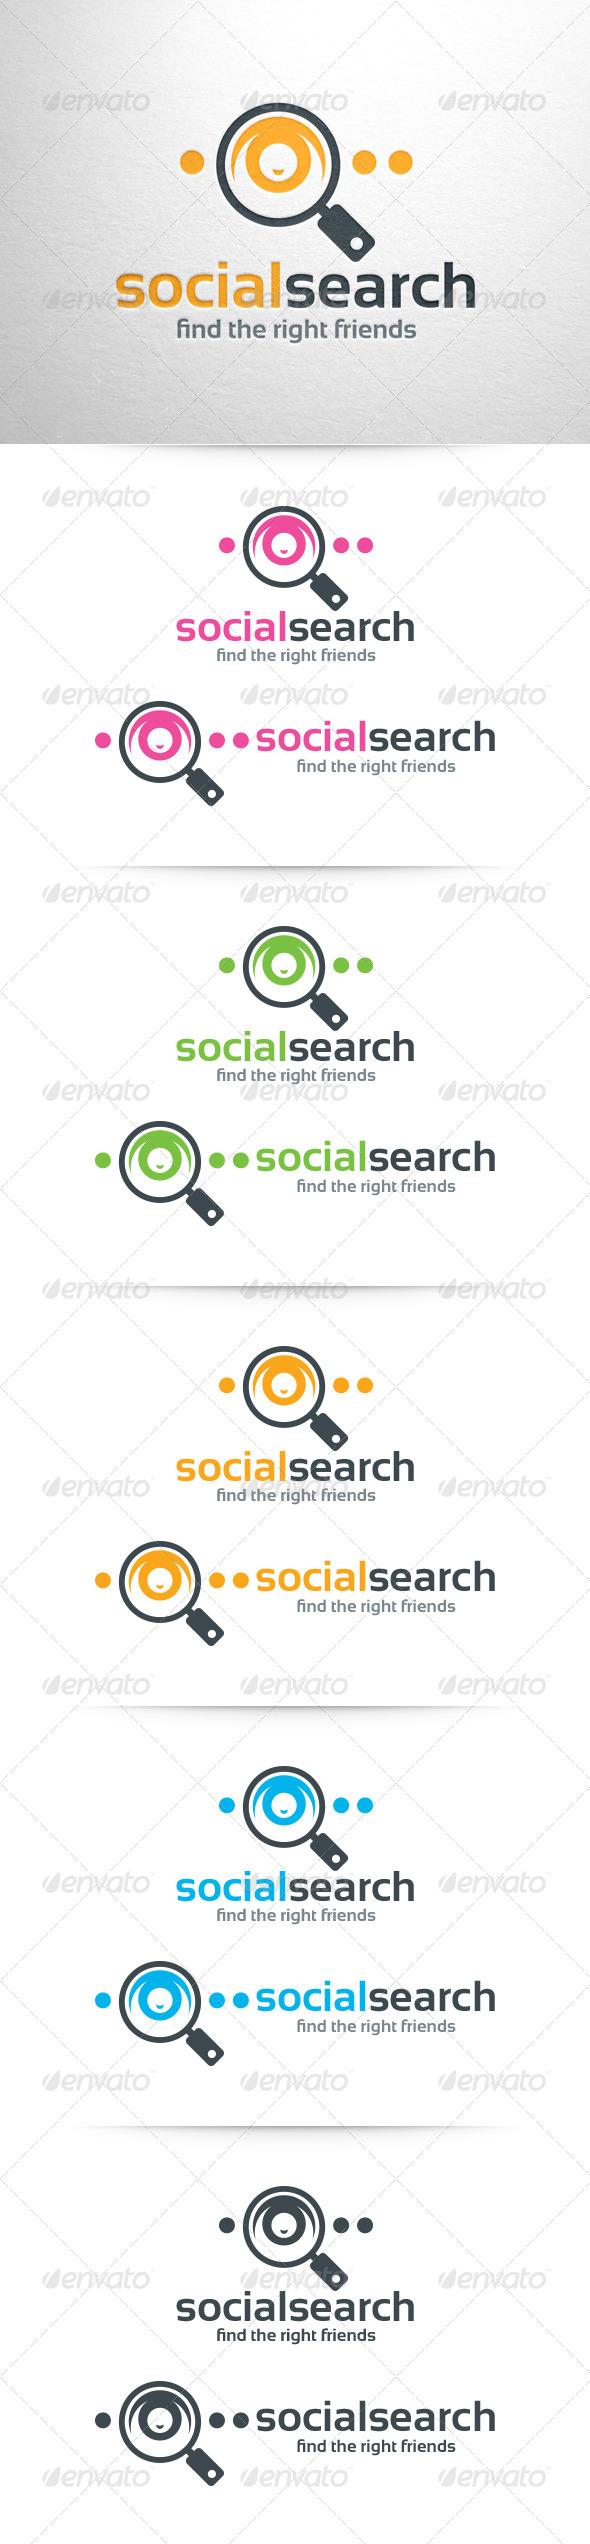 GraphicRiver Social Search Logo Template 6469844